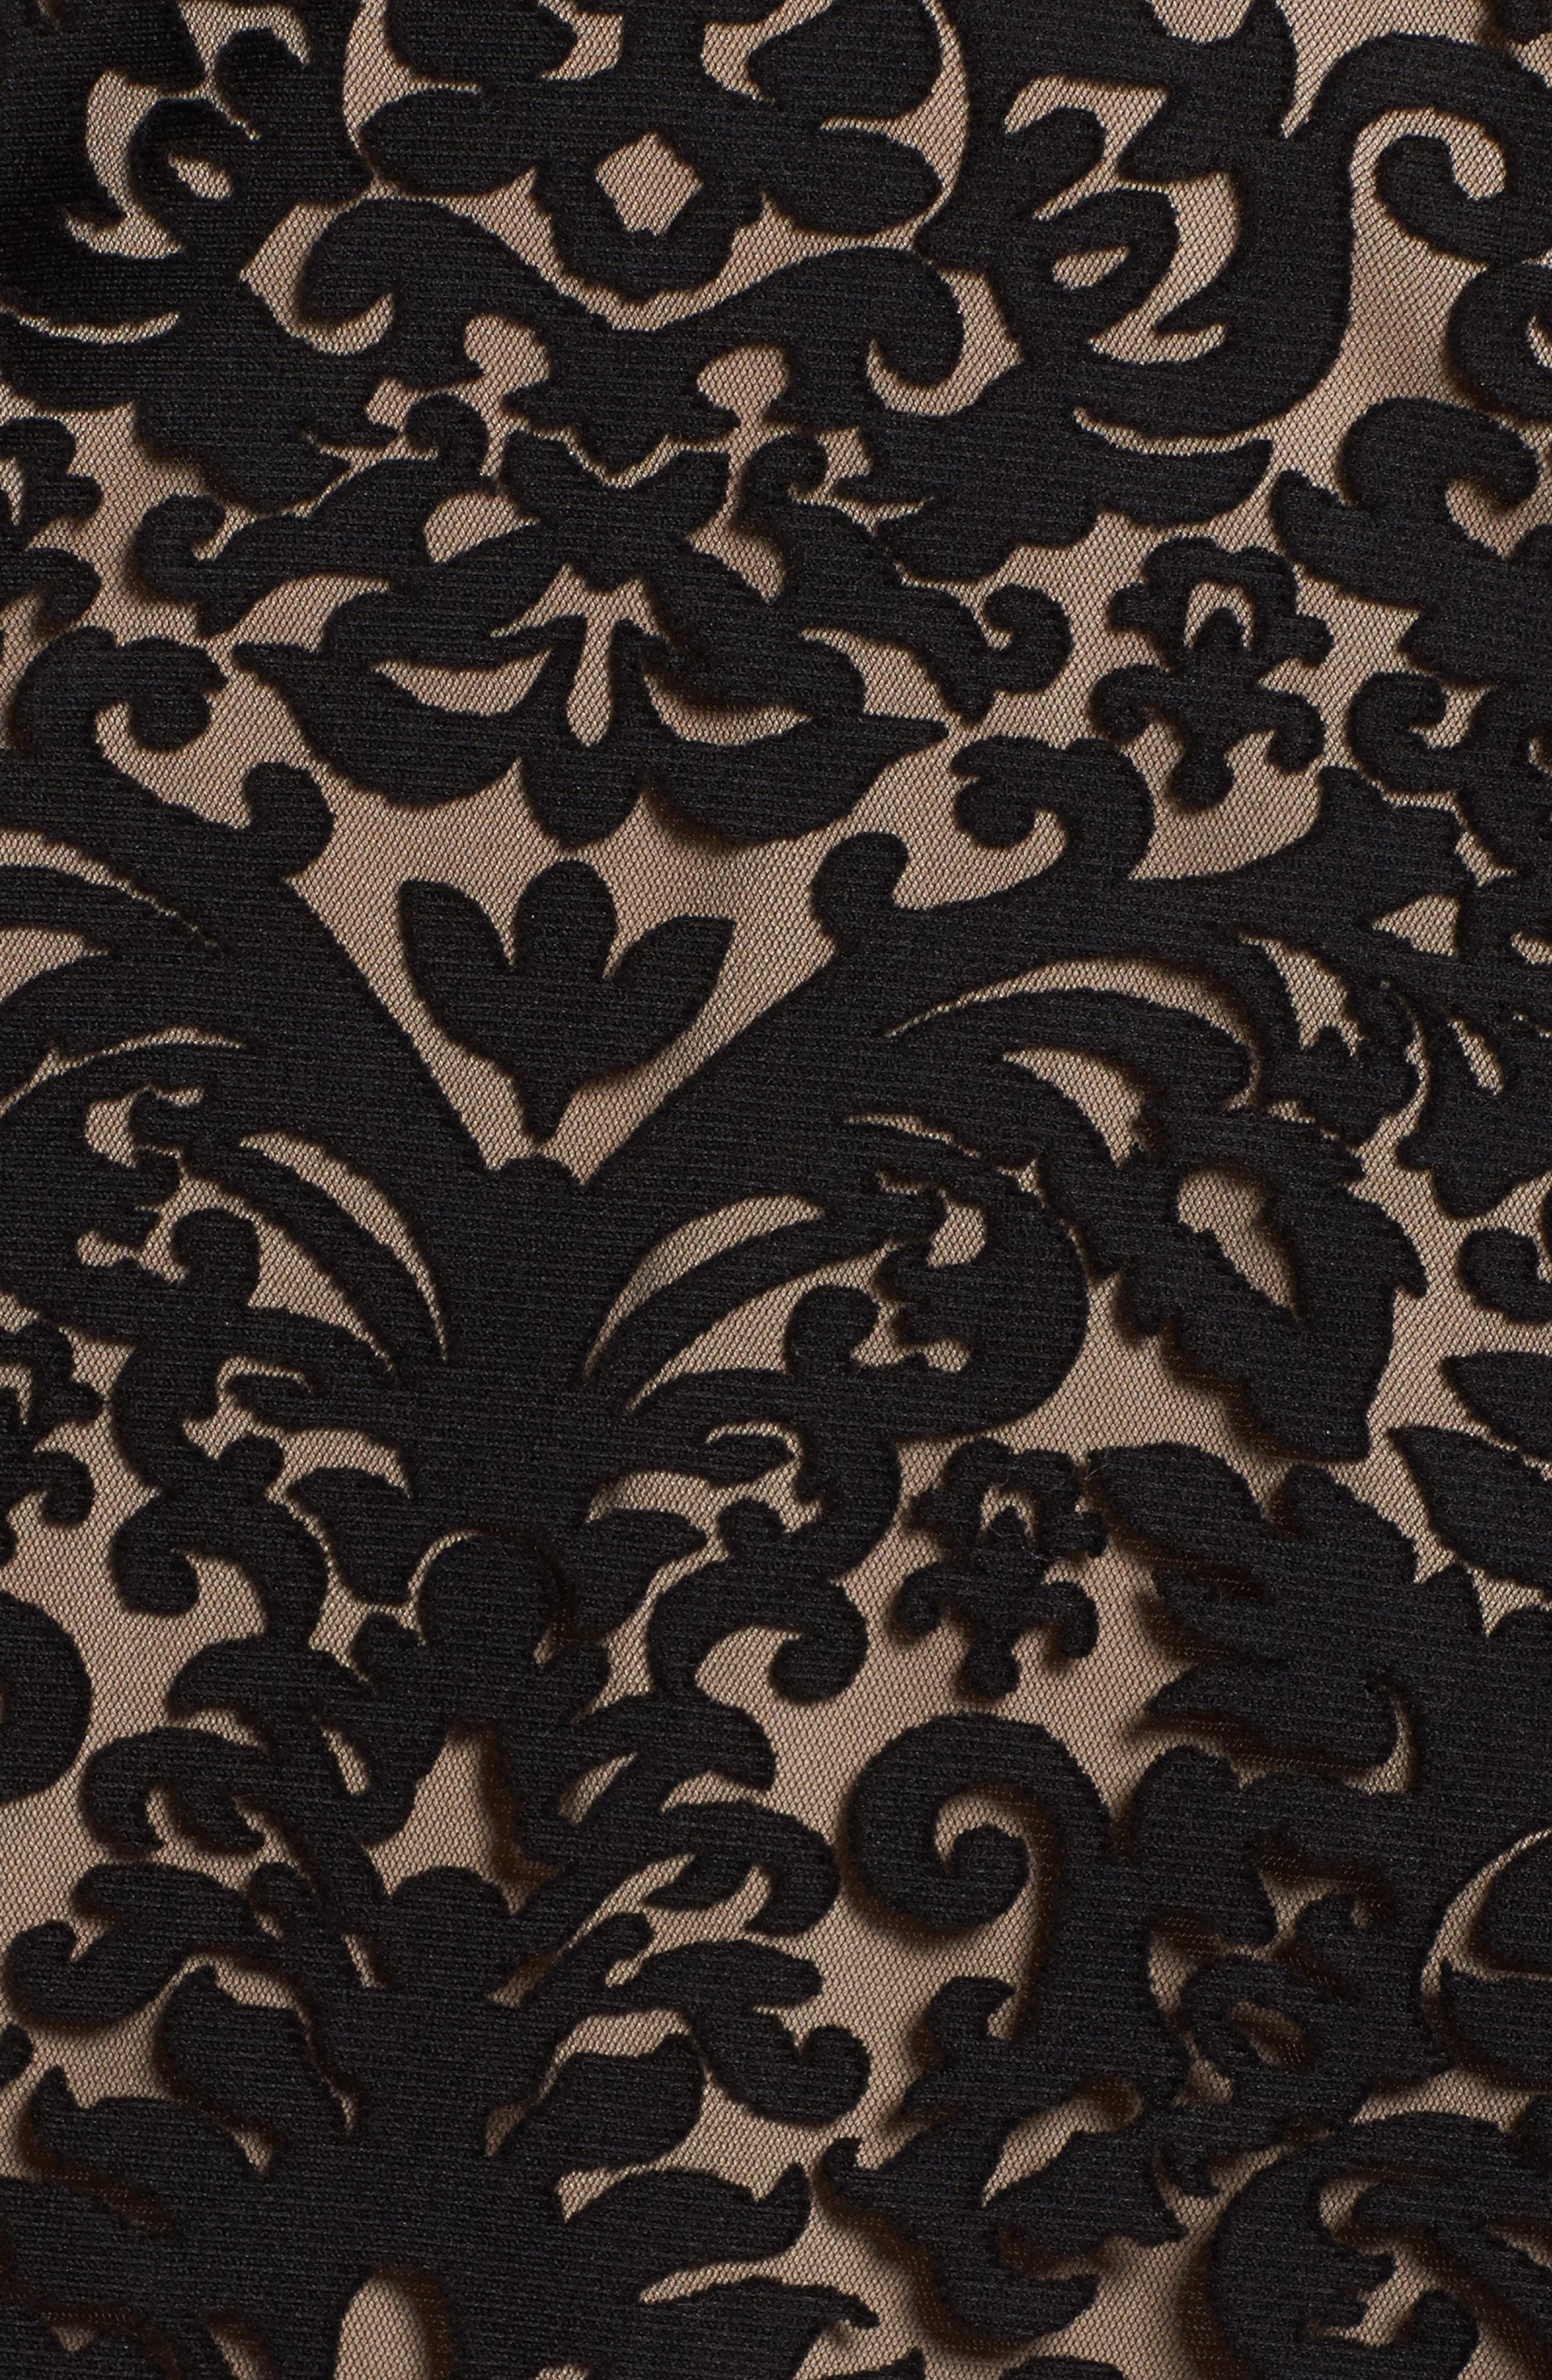 Lace Fit & Flare Dress,                             Alternate thumbnail 5, color,                             Black/ Nude